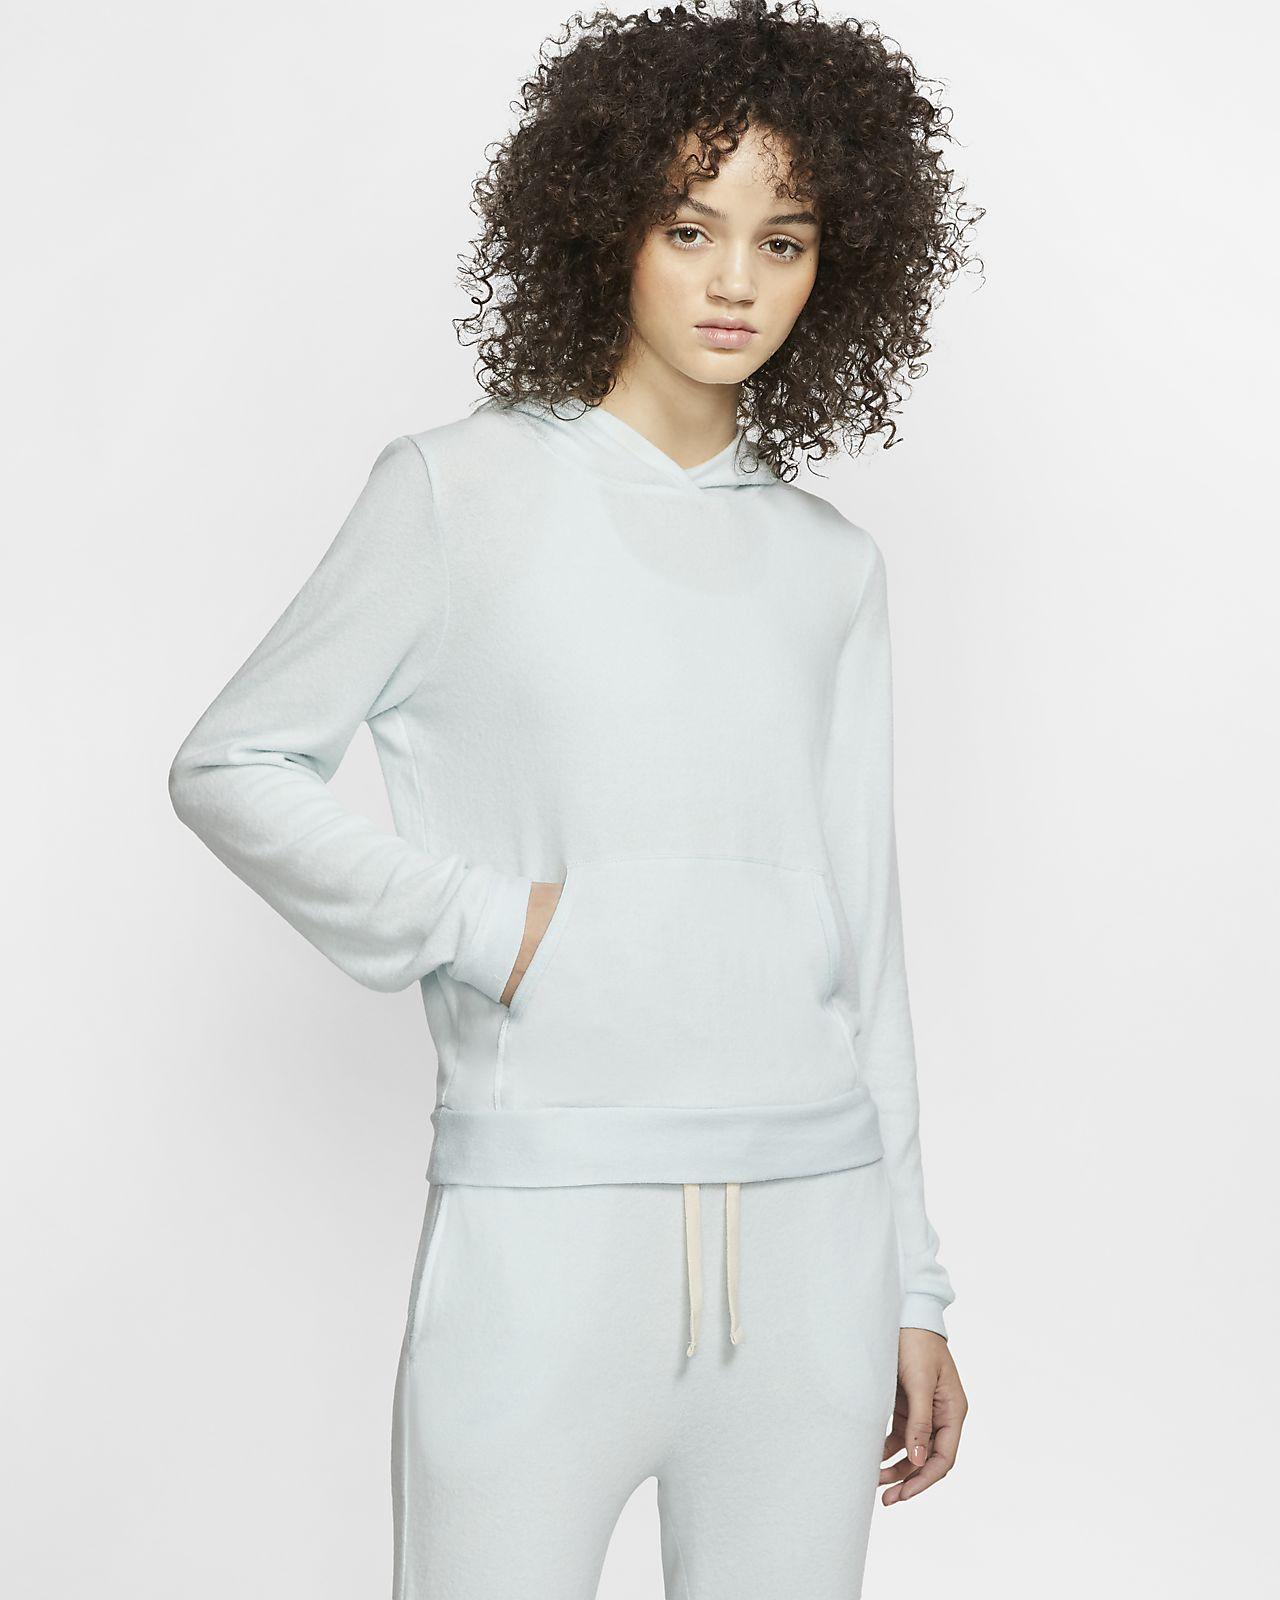 Hurley Chill Women's Fleece Sweatshirt